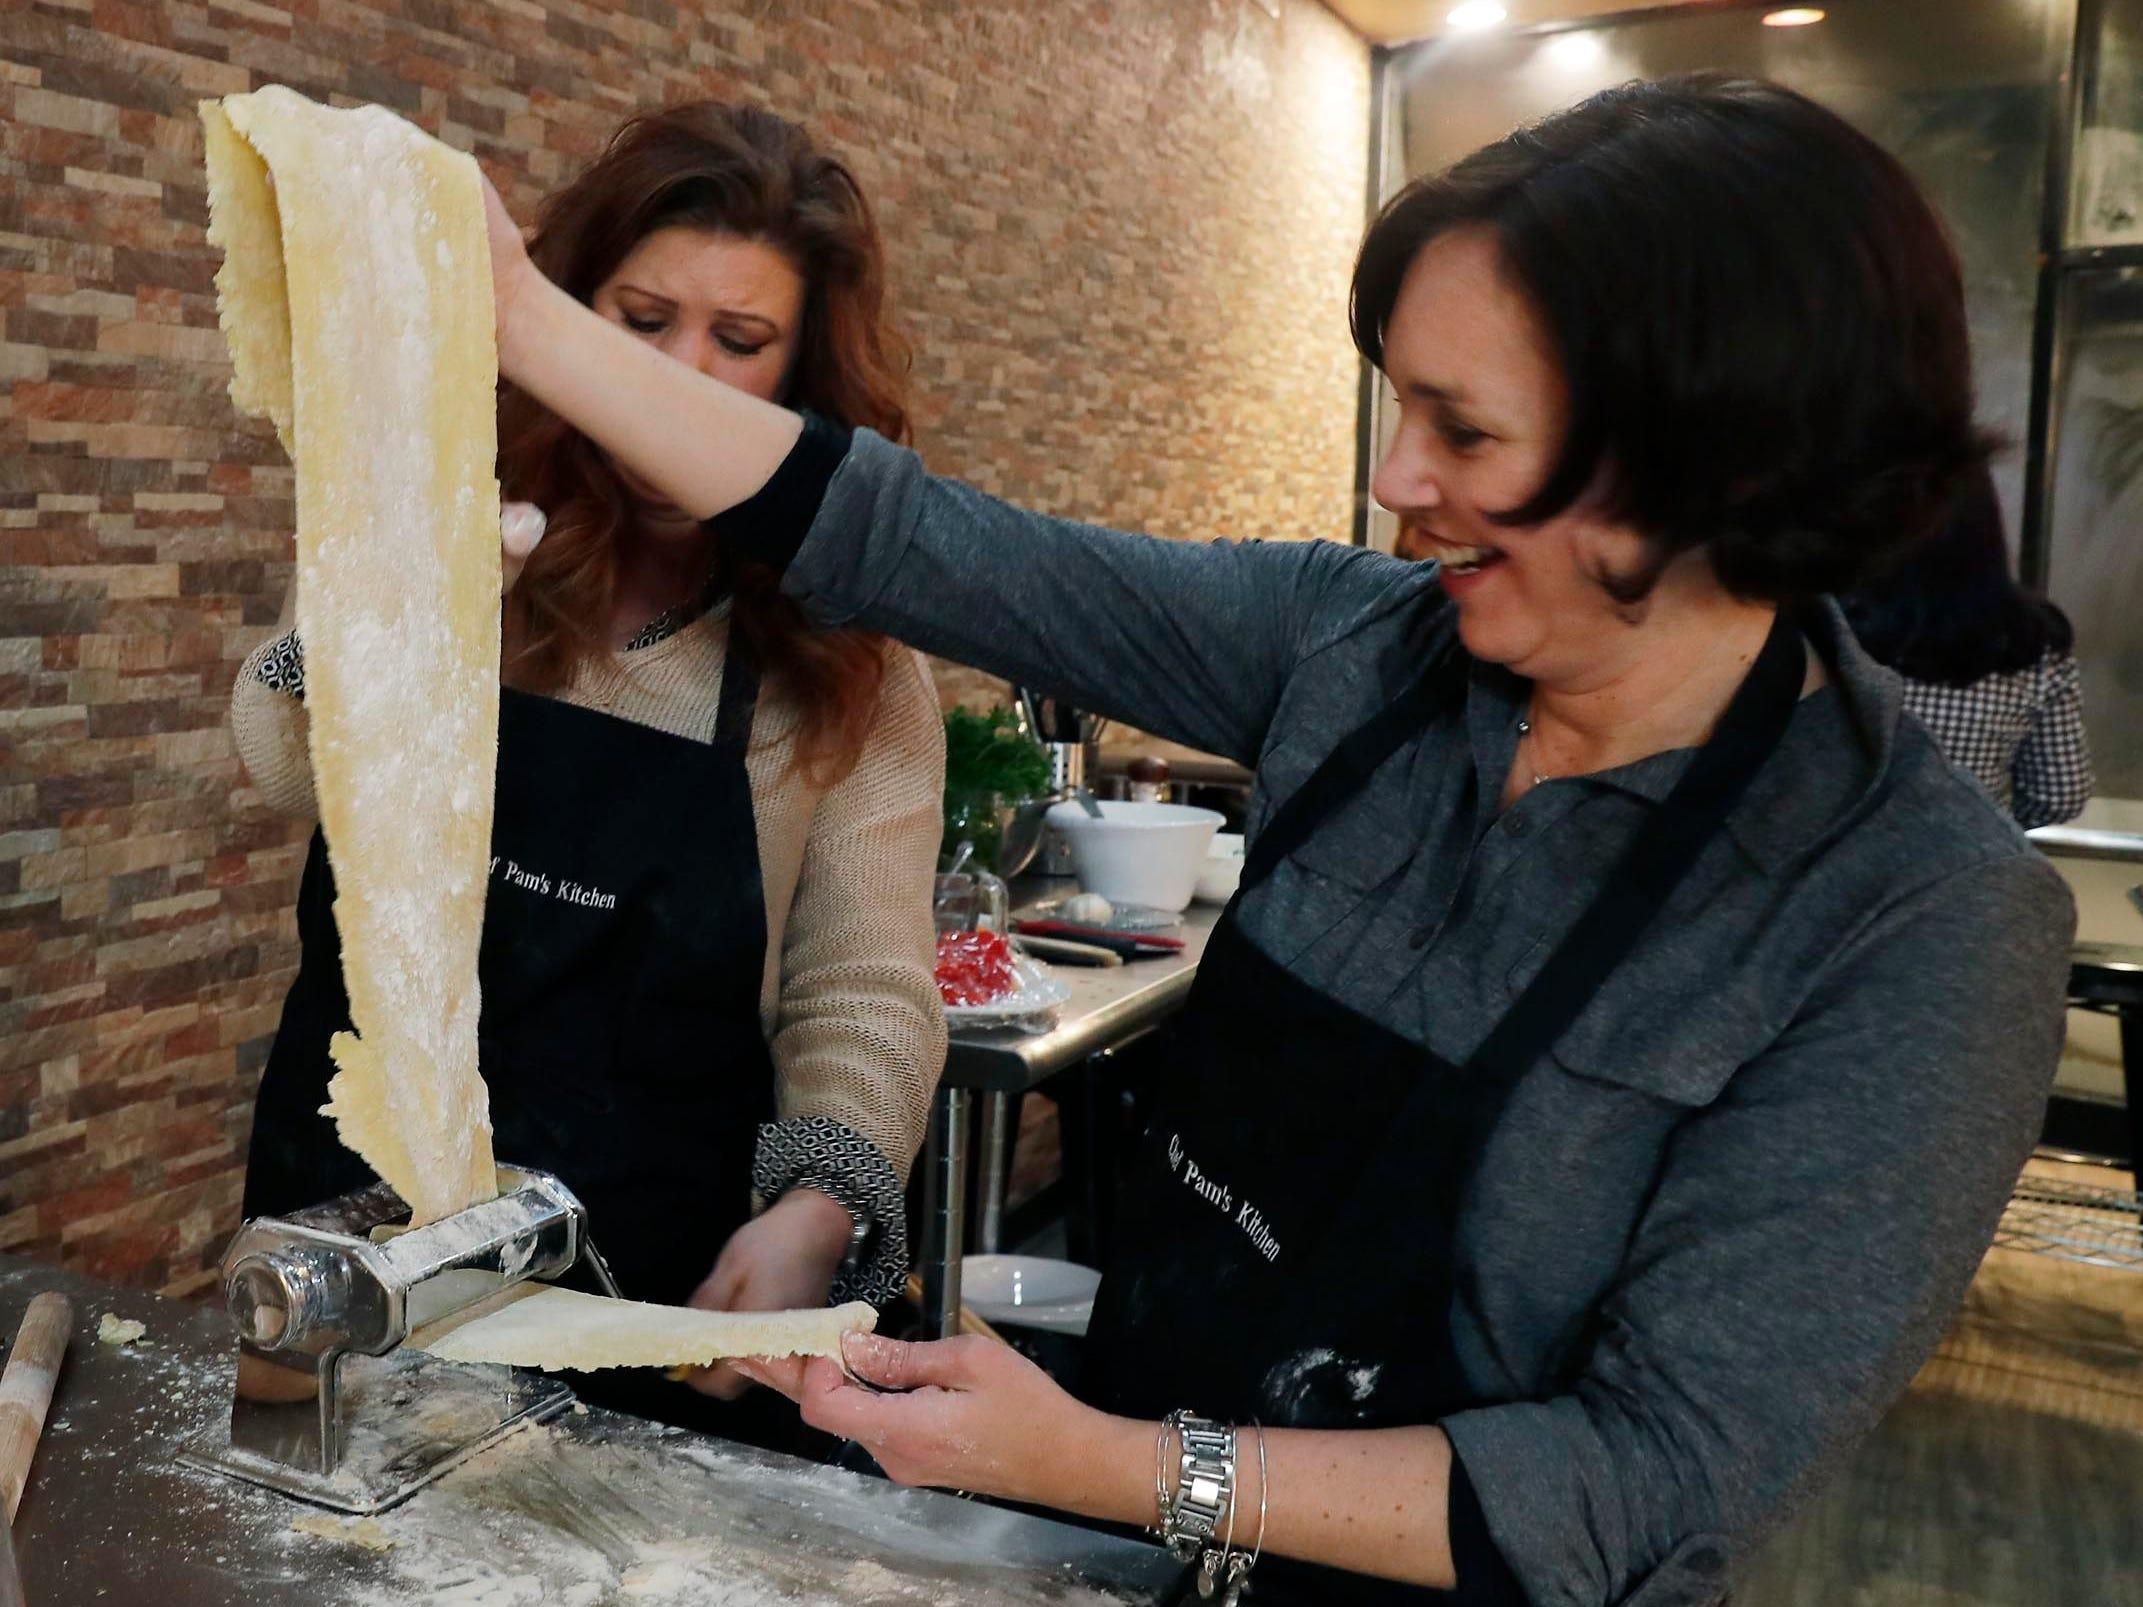 Chris Liedtke (left) and Beth Zeiler work together to run ravioli dough through a pasta press.